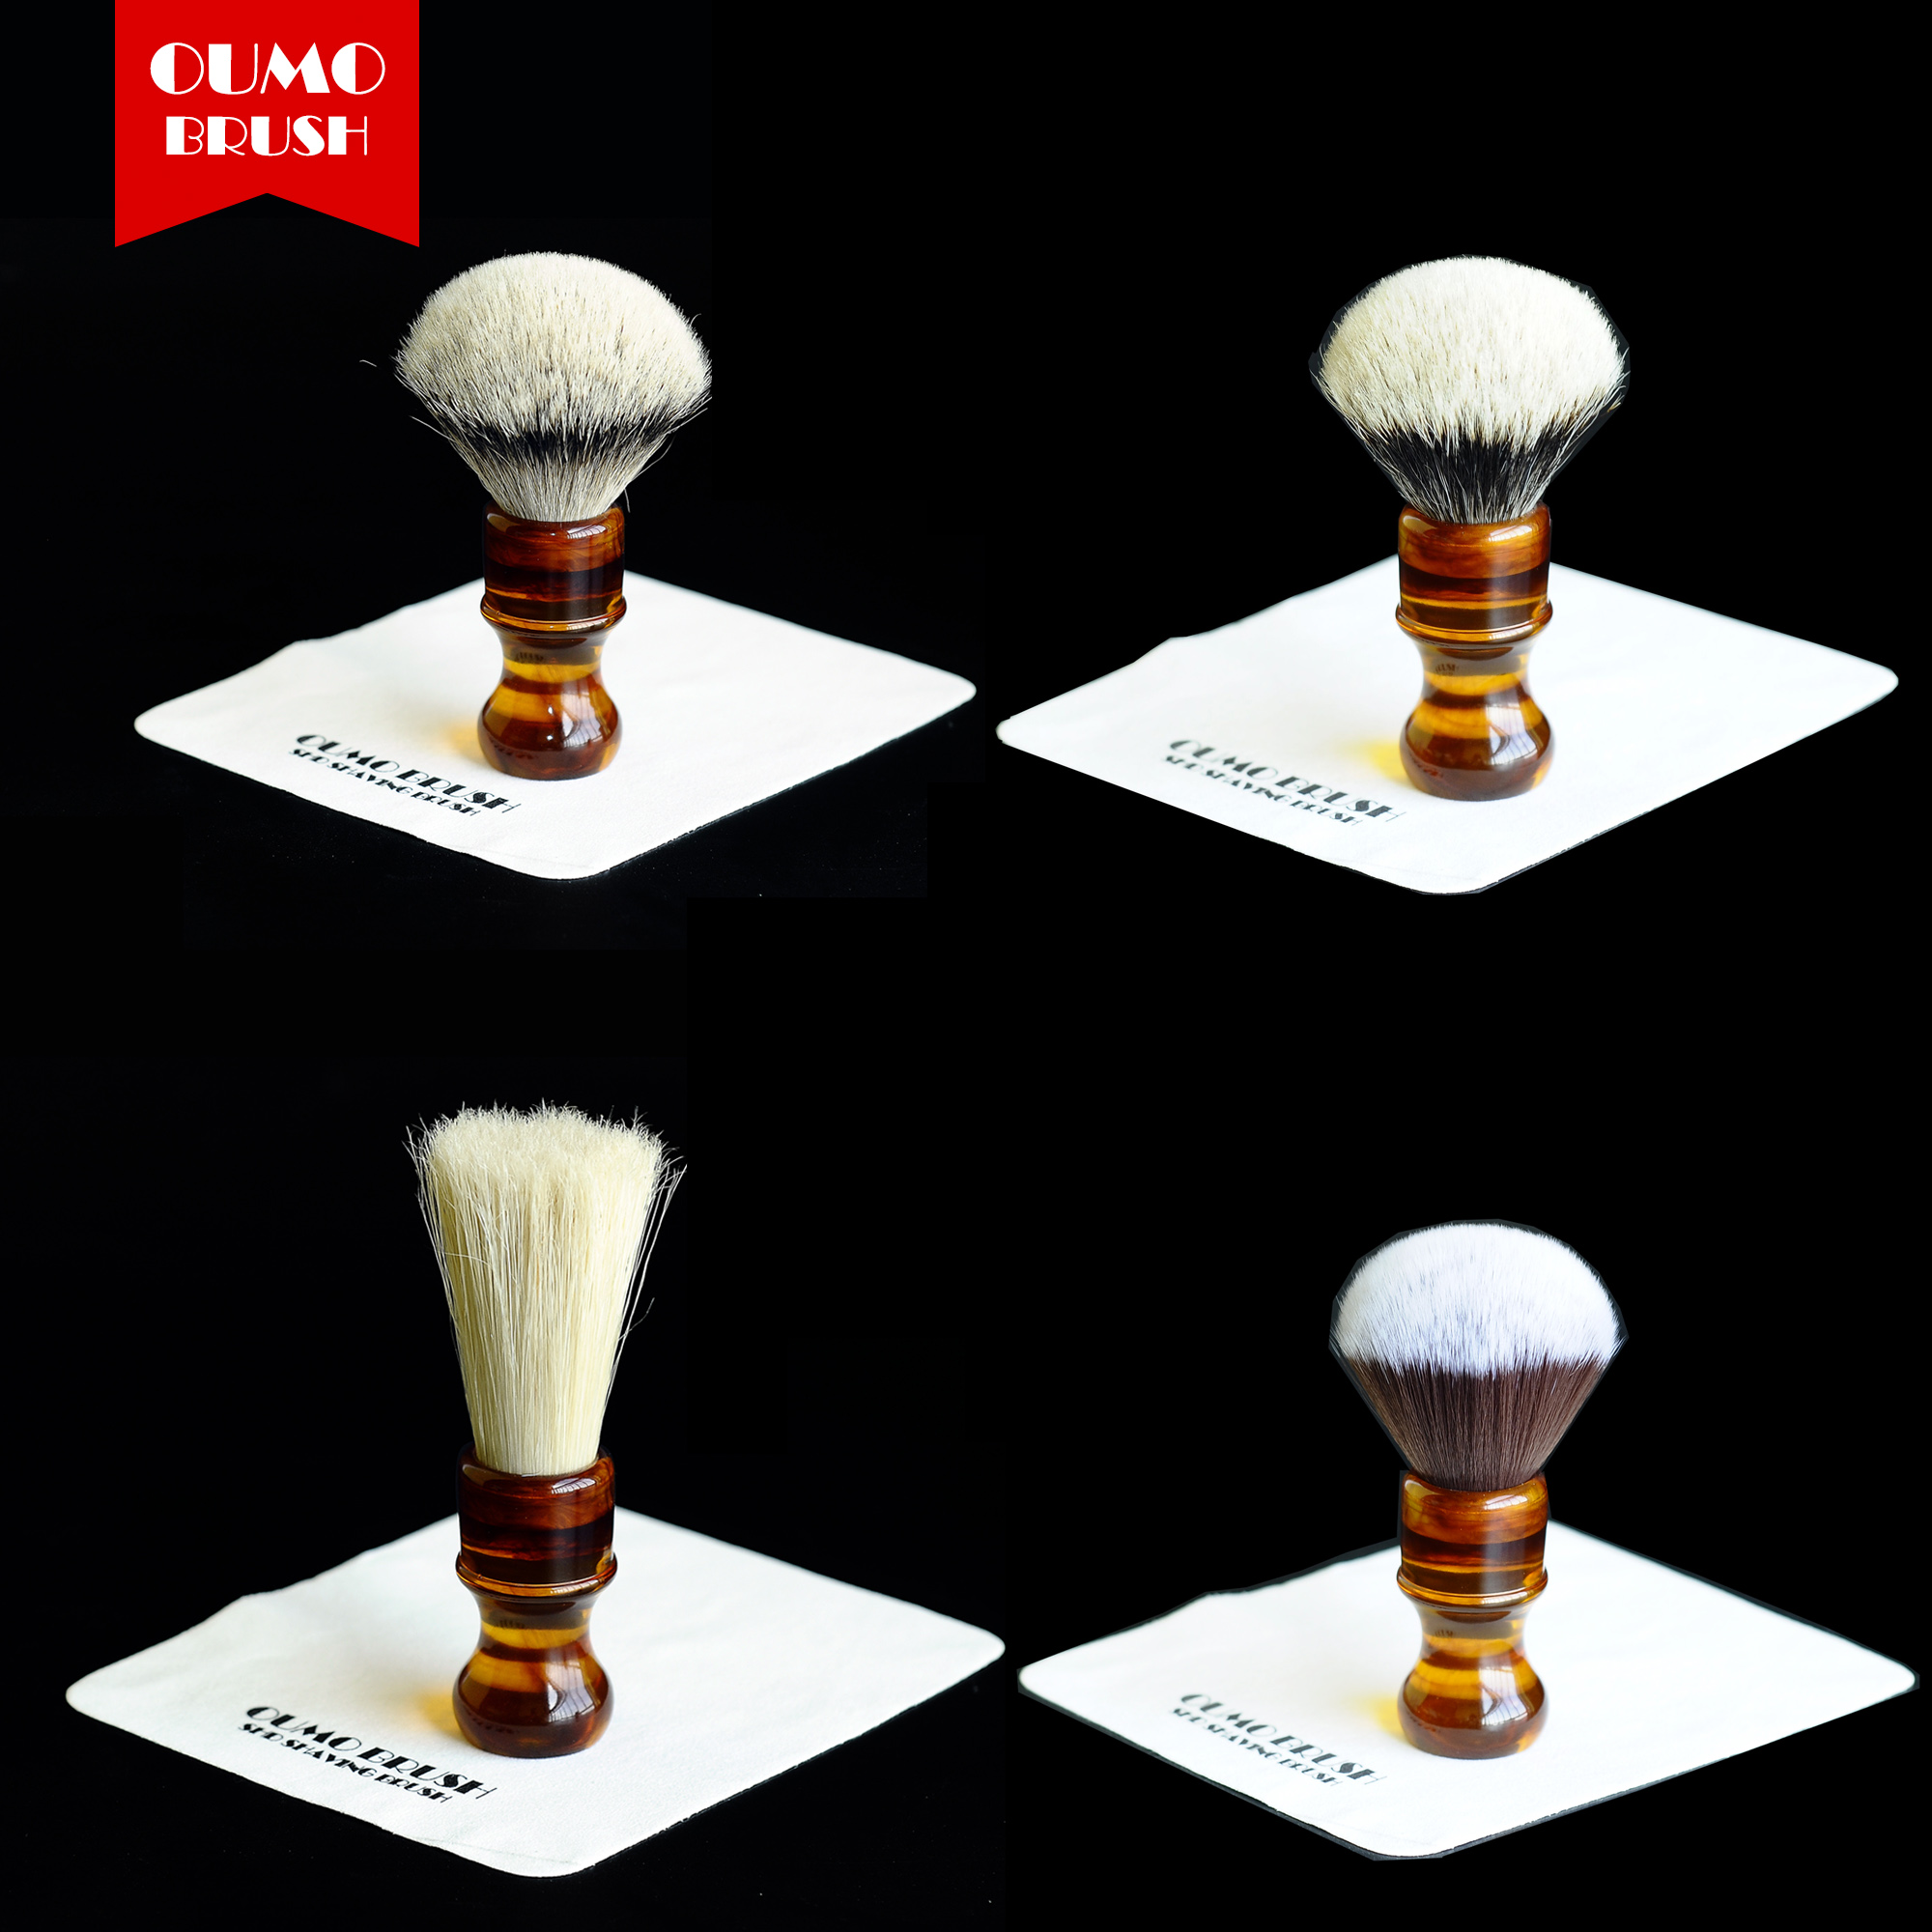 OUMO BRUSH amber resin handle shaving brushes with different shaving brush knots-in Shaving Brush from Beauty & Health